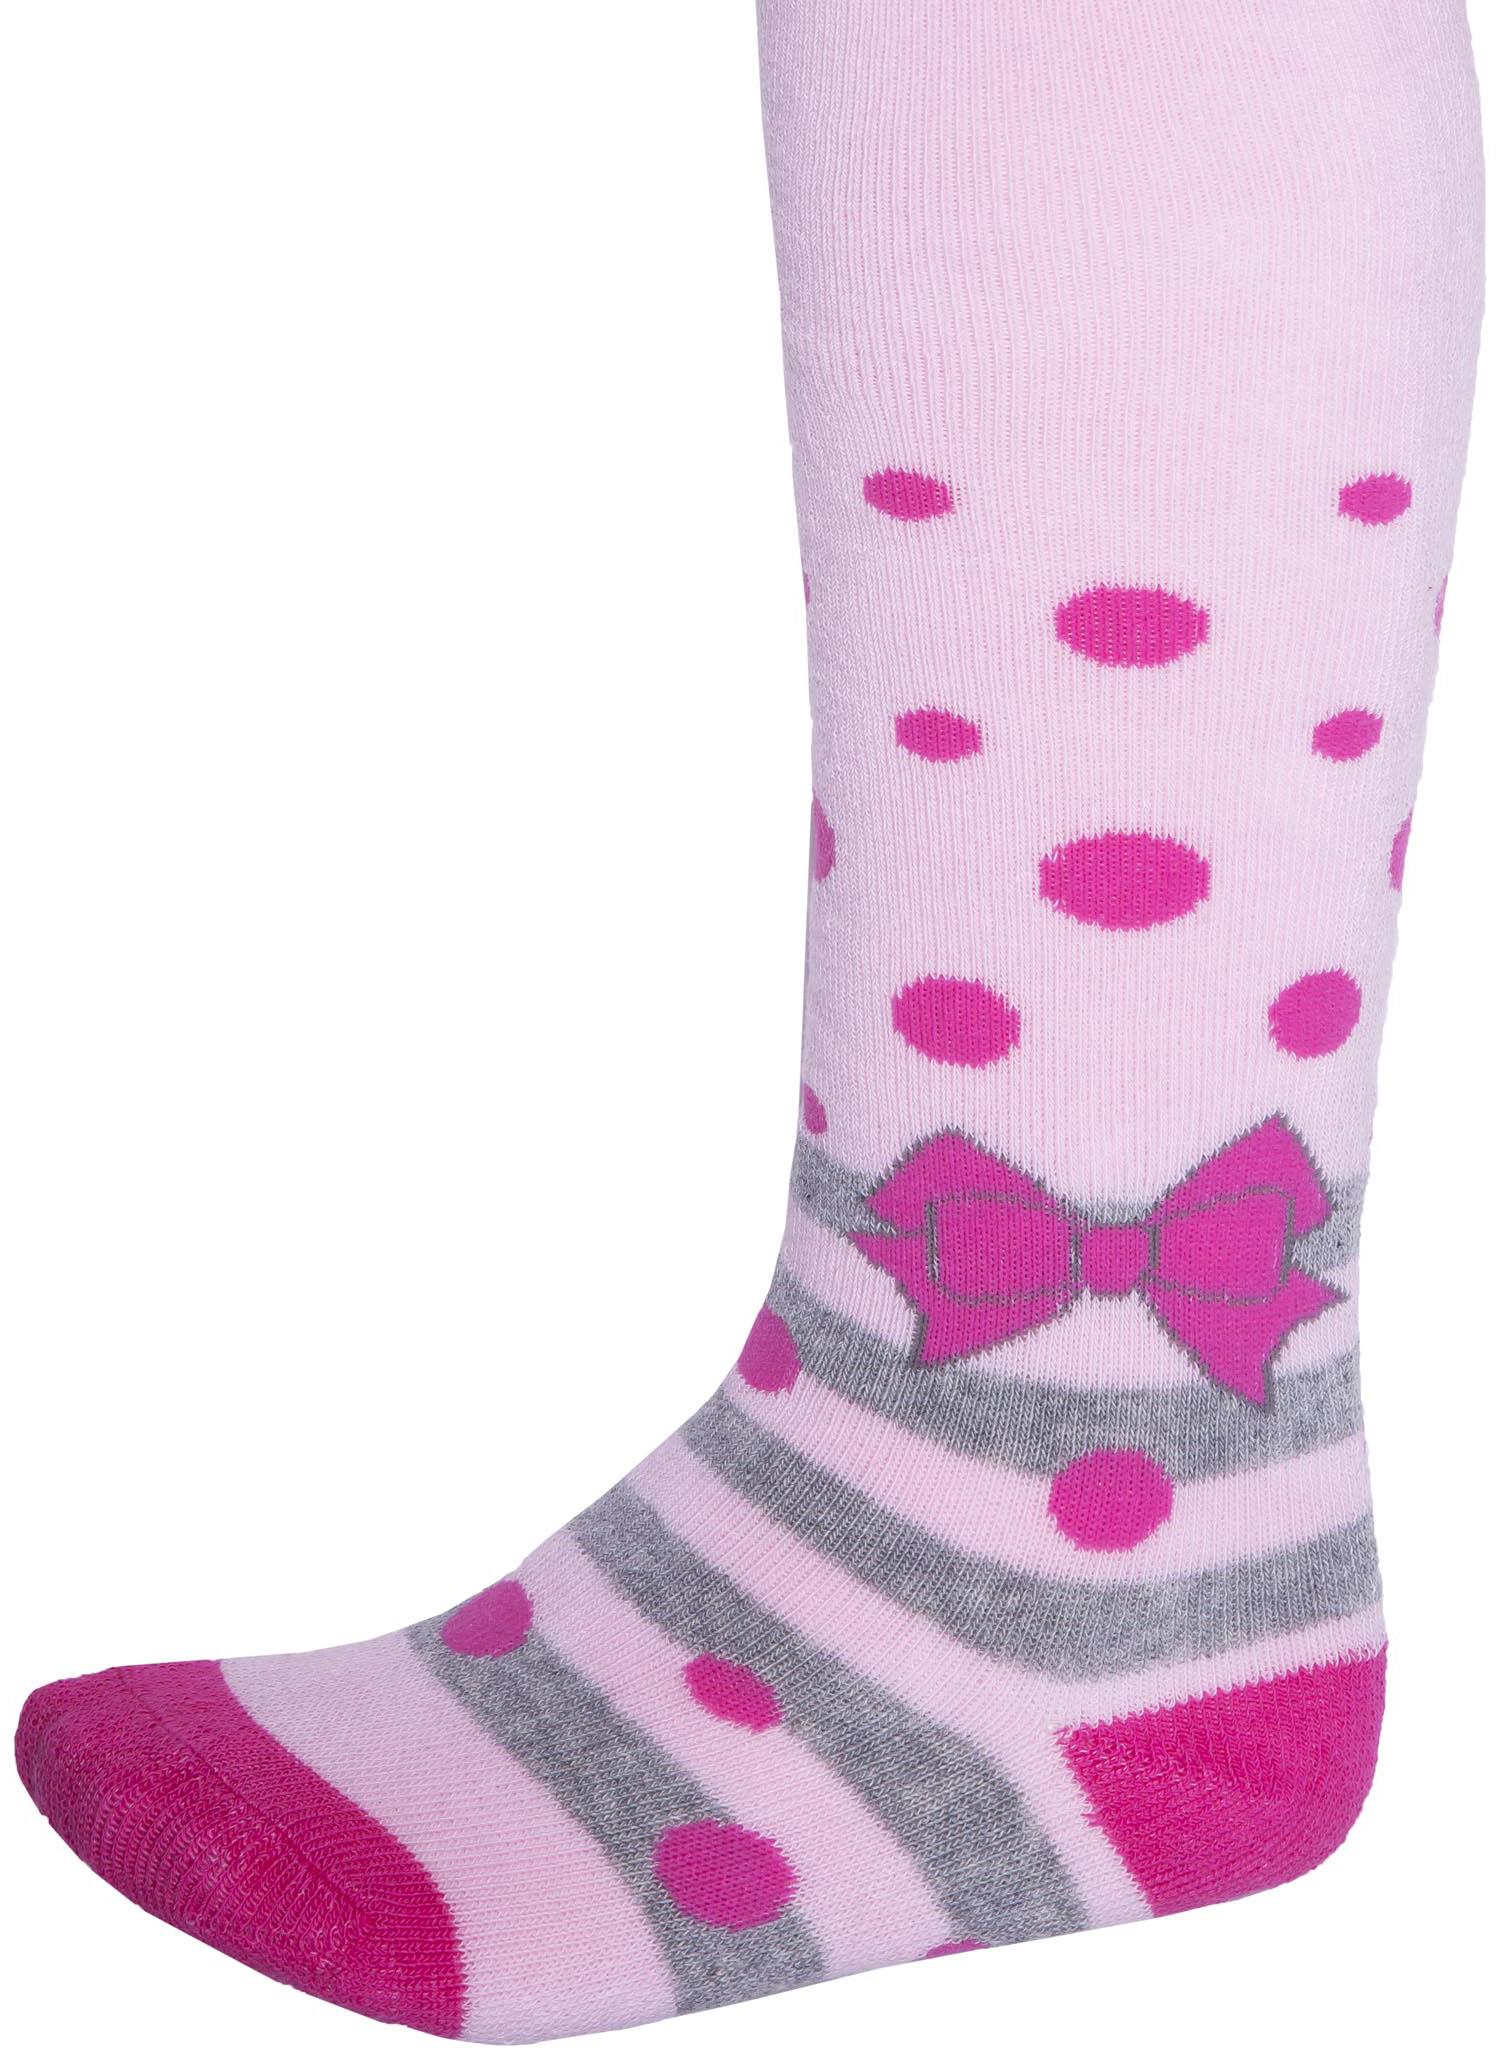 Колготки Barkito Бантик розовые колготки кидис колготки х б 8 марта розовые